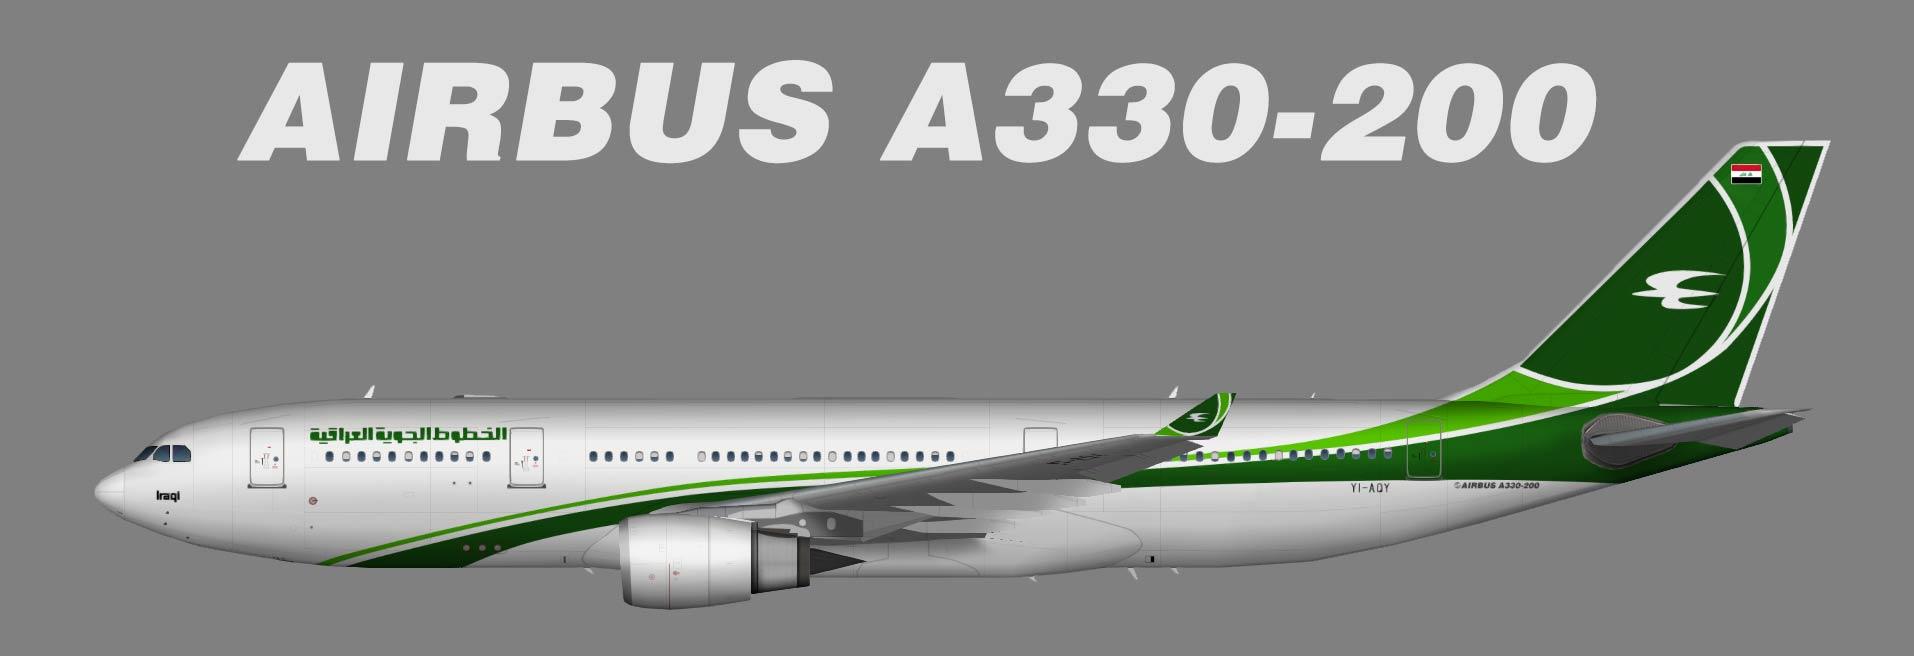 Iraqi Airways Airbus A330-200